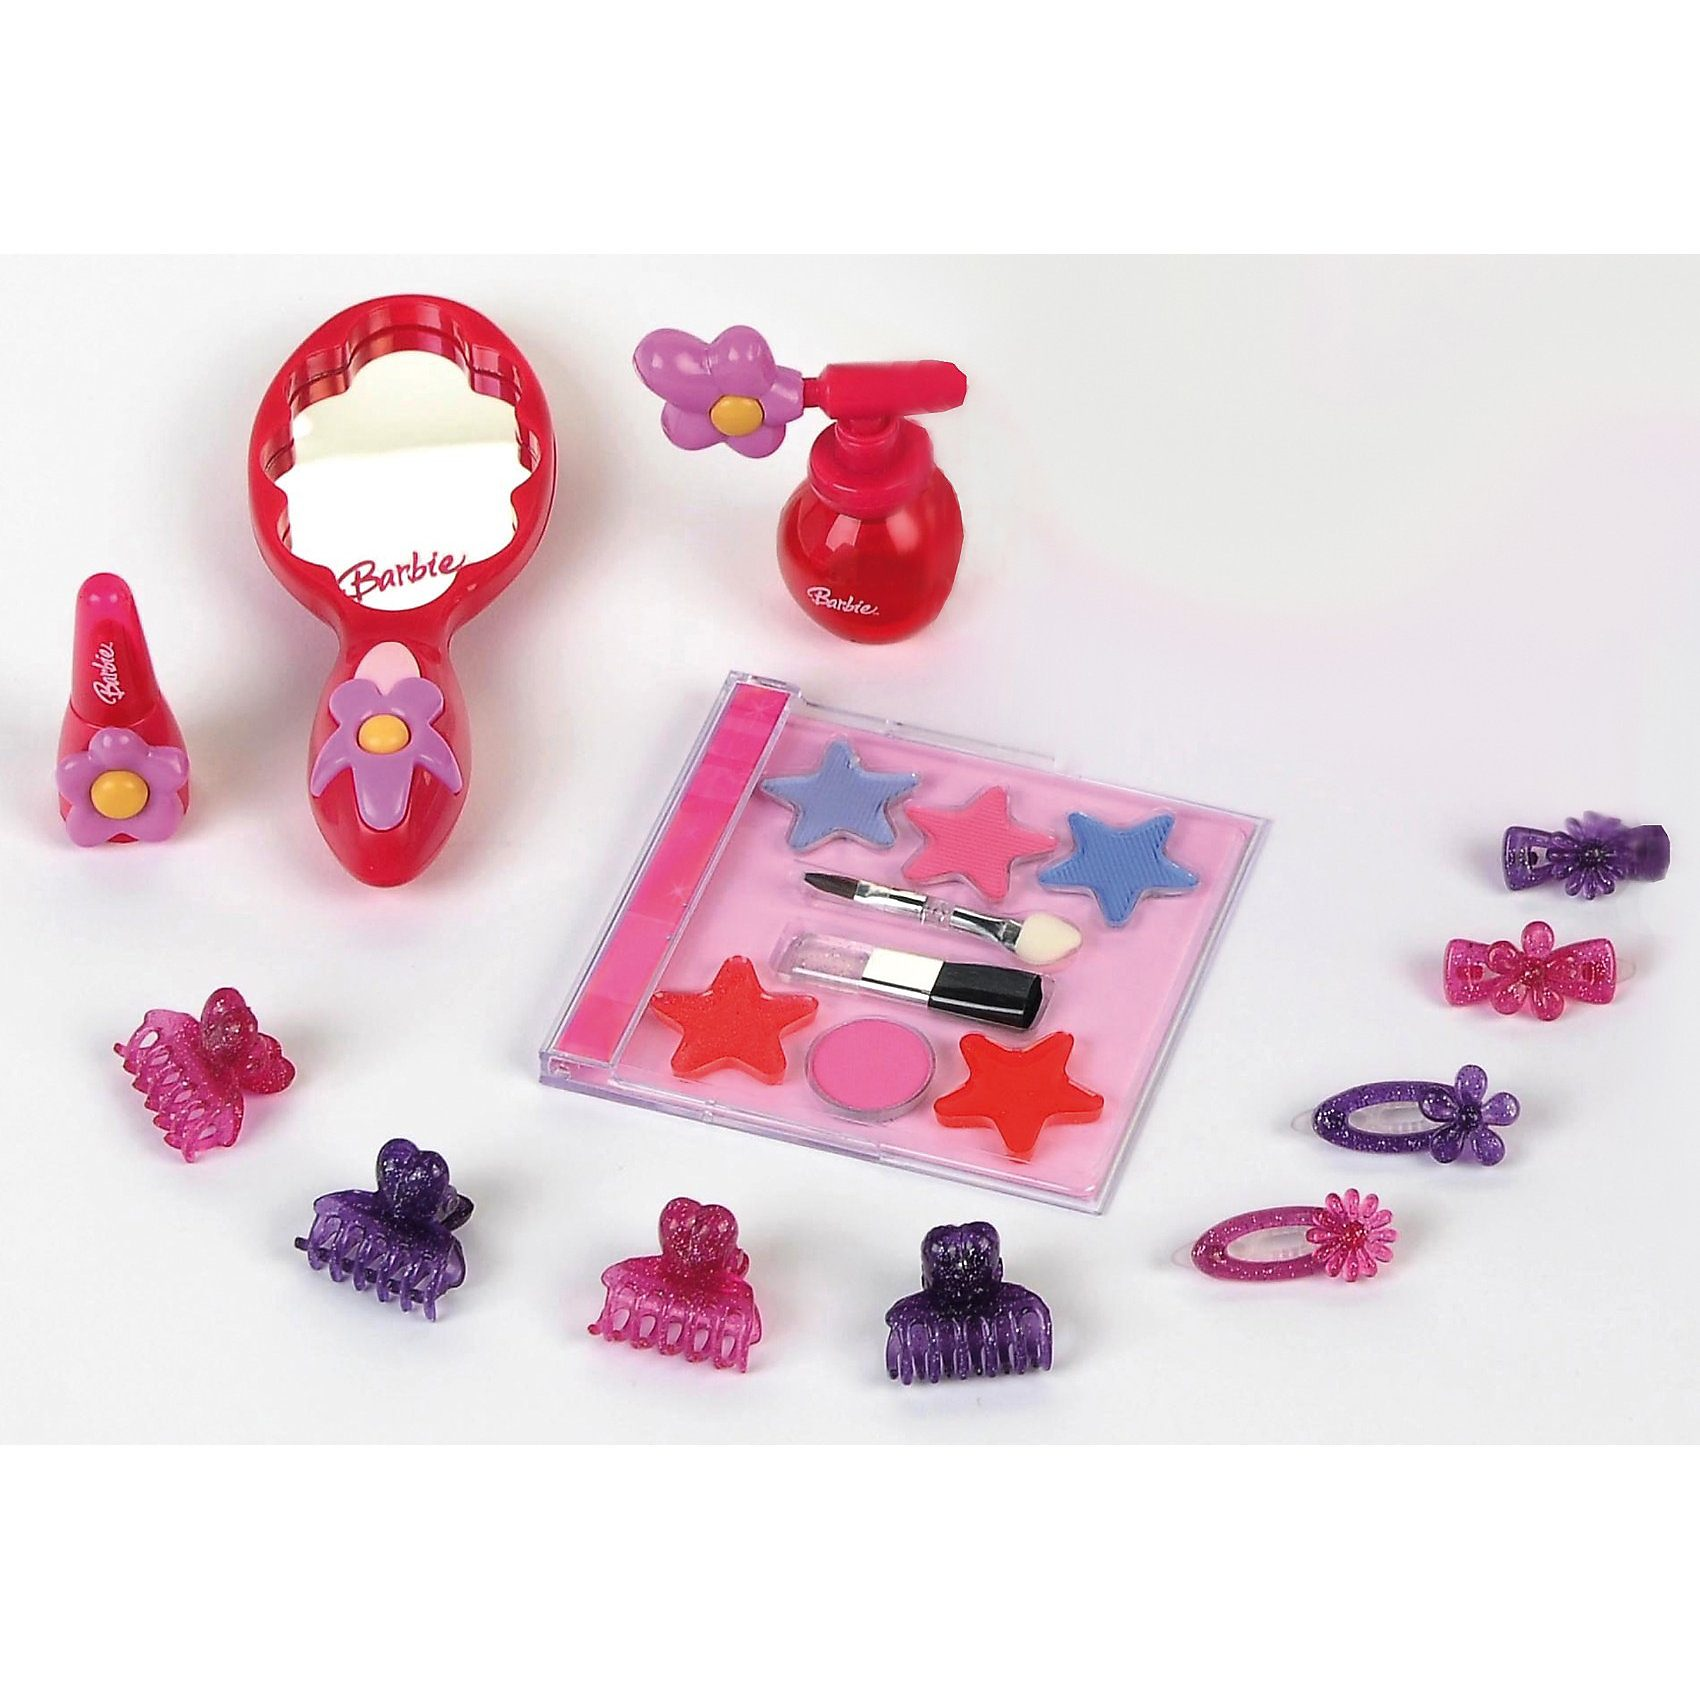 Klein Barbie Kosmetikset, groß